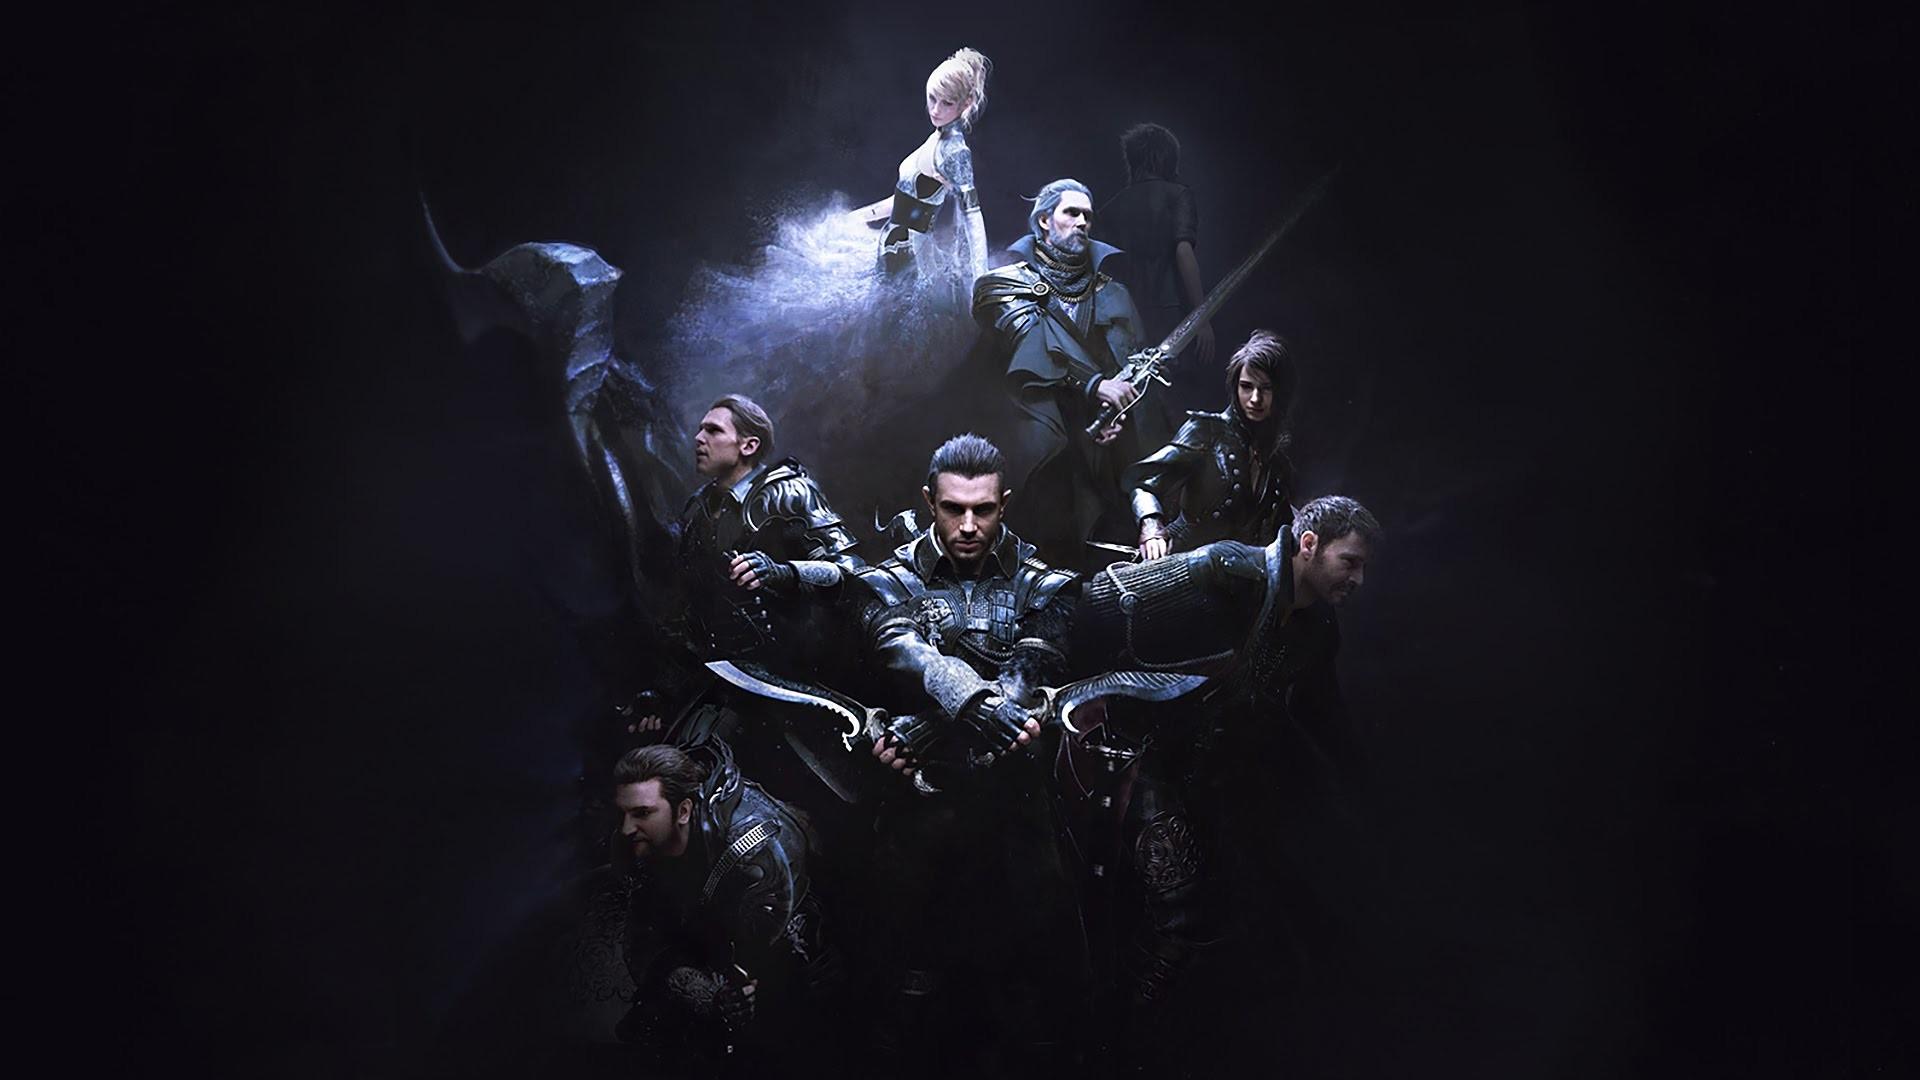 [Final Fantasy XV OST] – Apocalypsis Noctis [HD] – YouTube